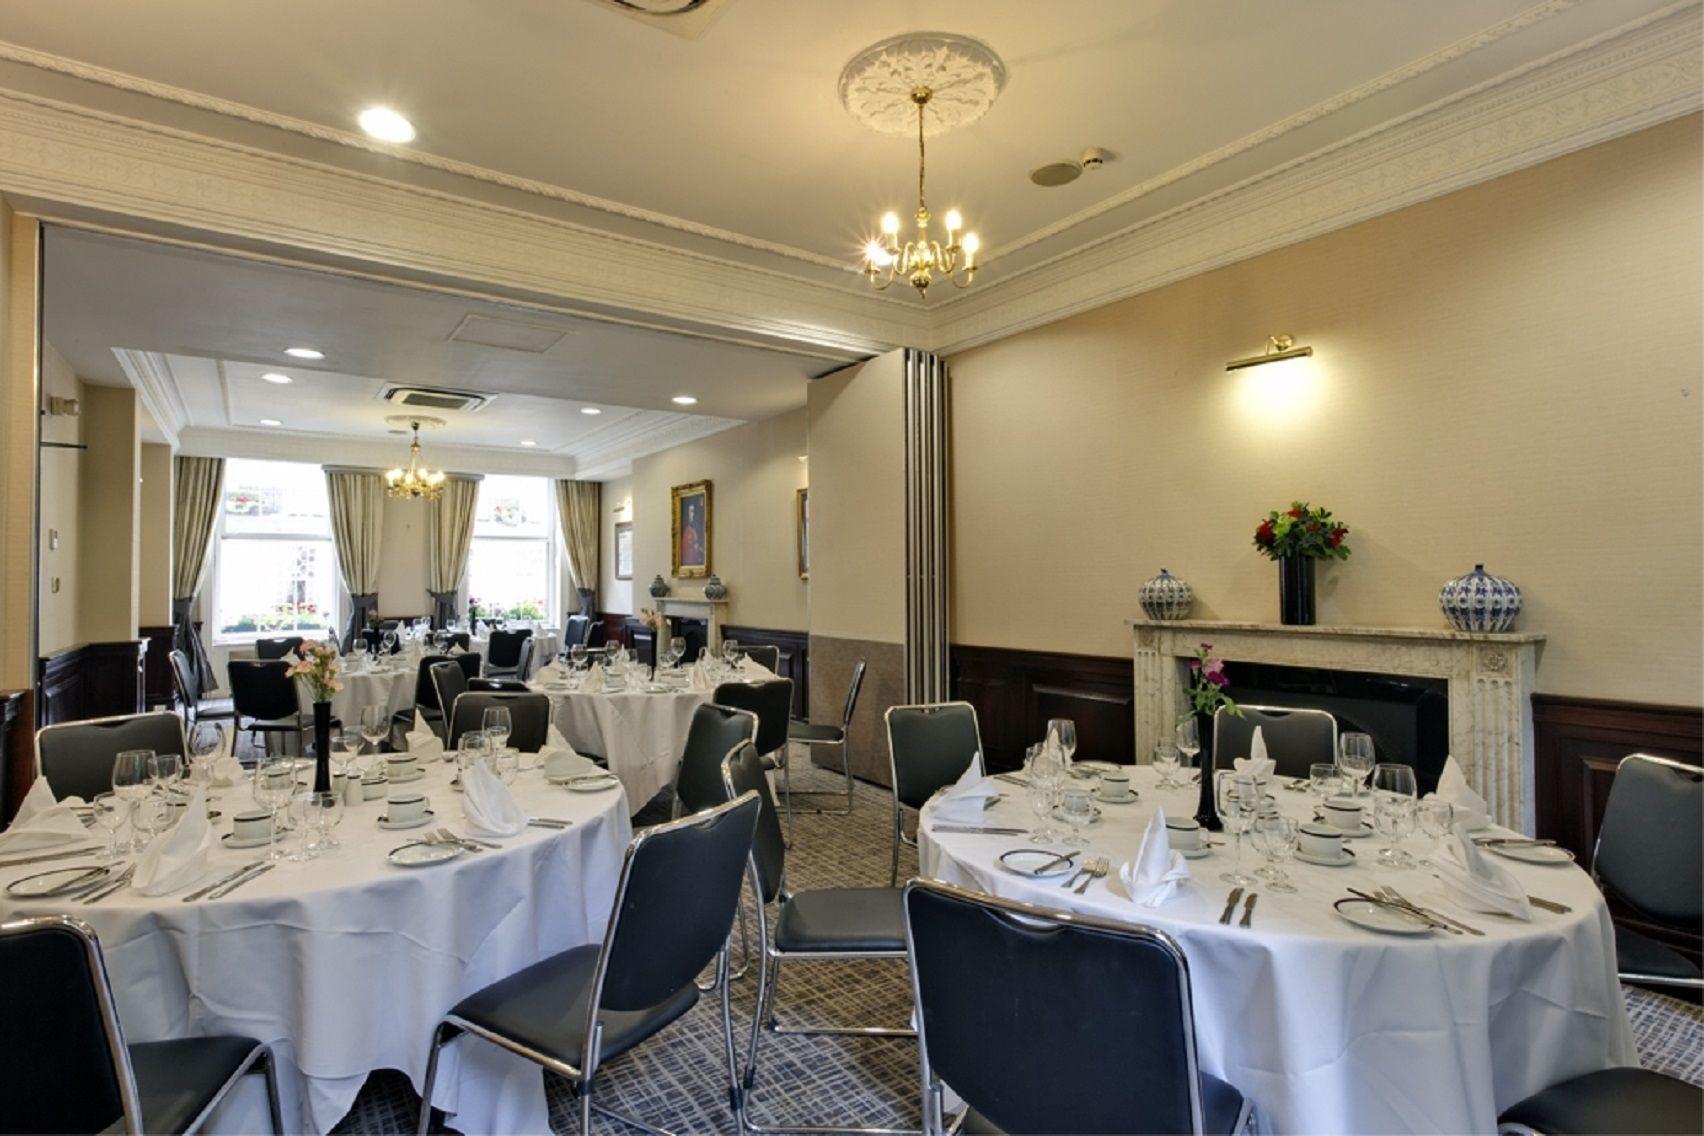 Villiers Suite, 4* Grange White Hall Hotel